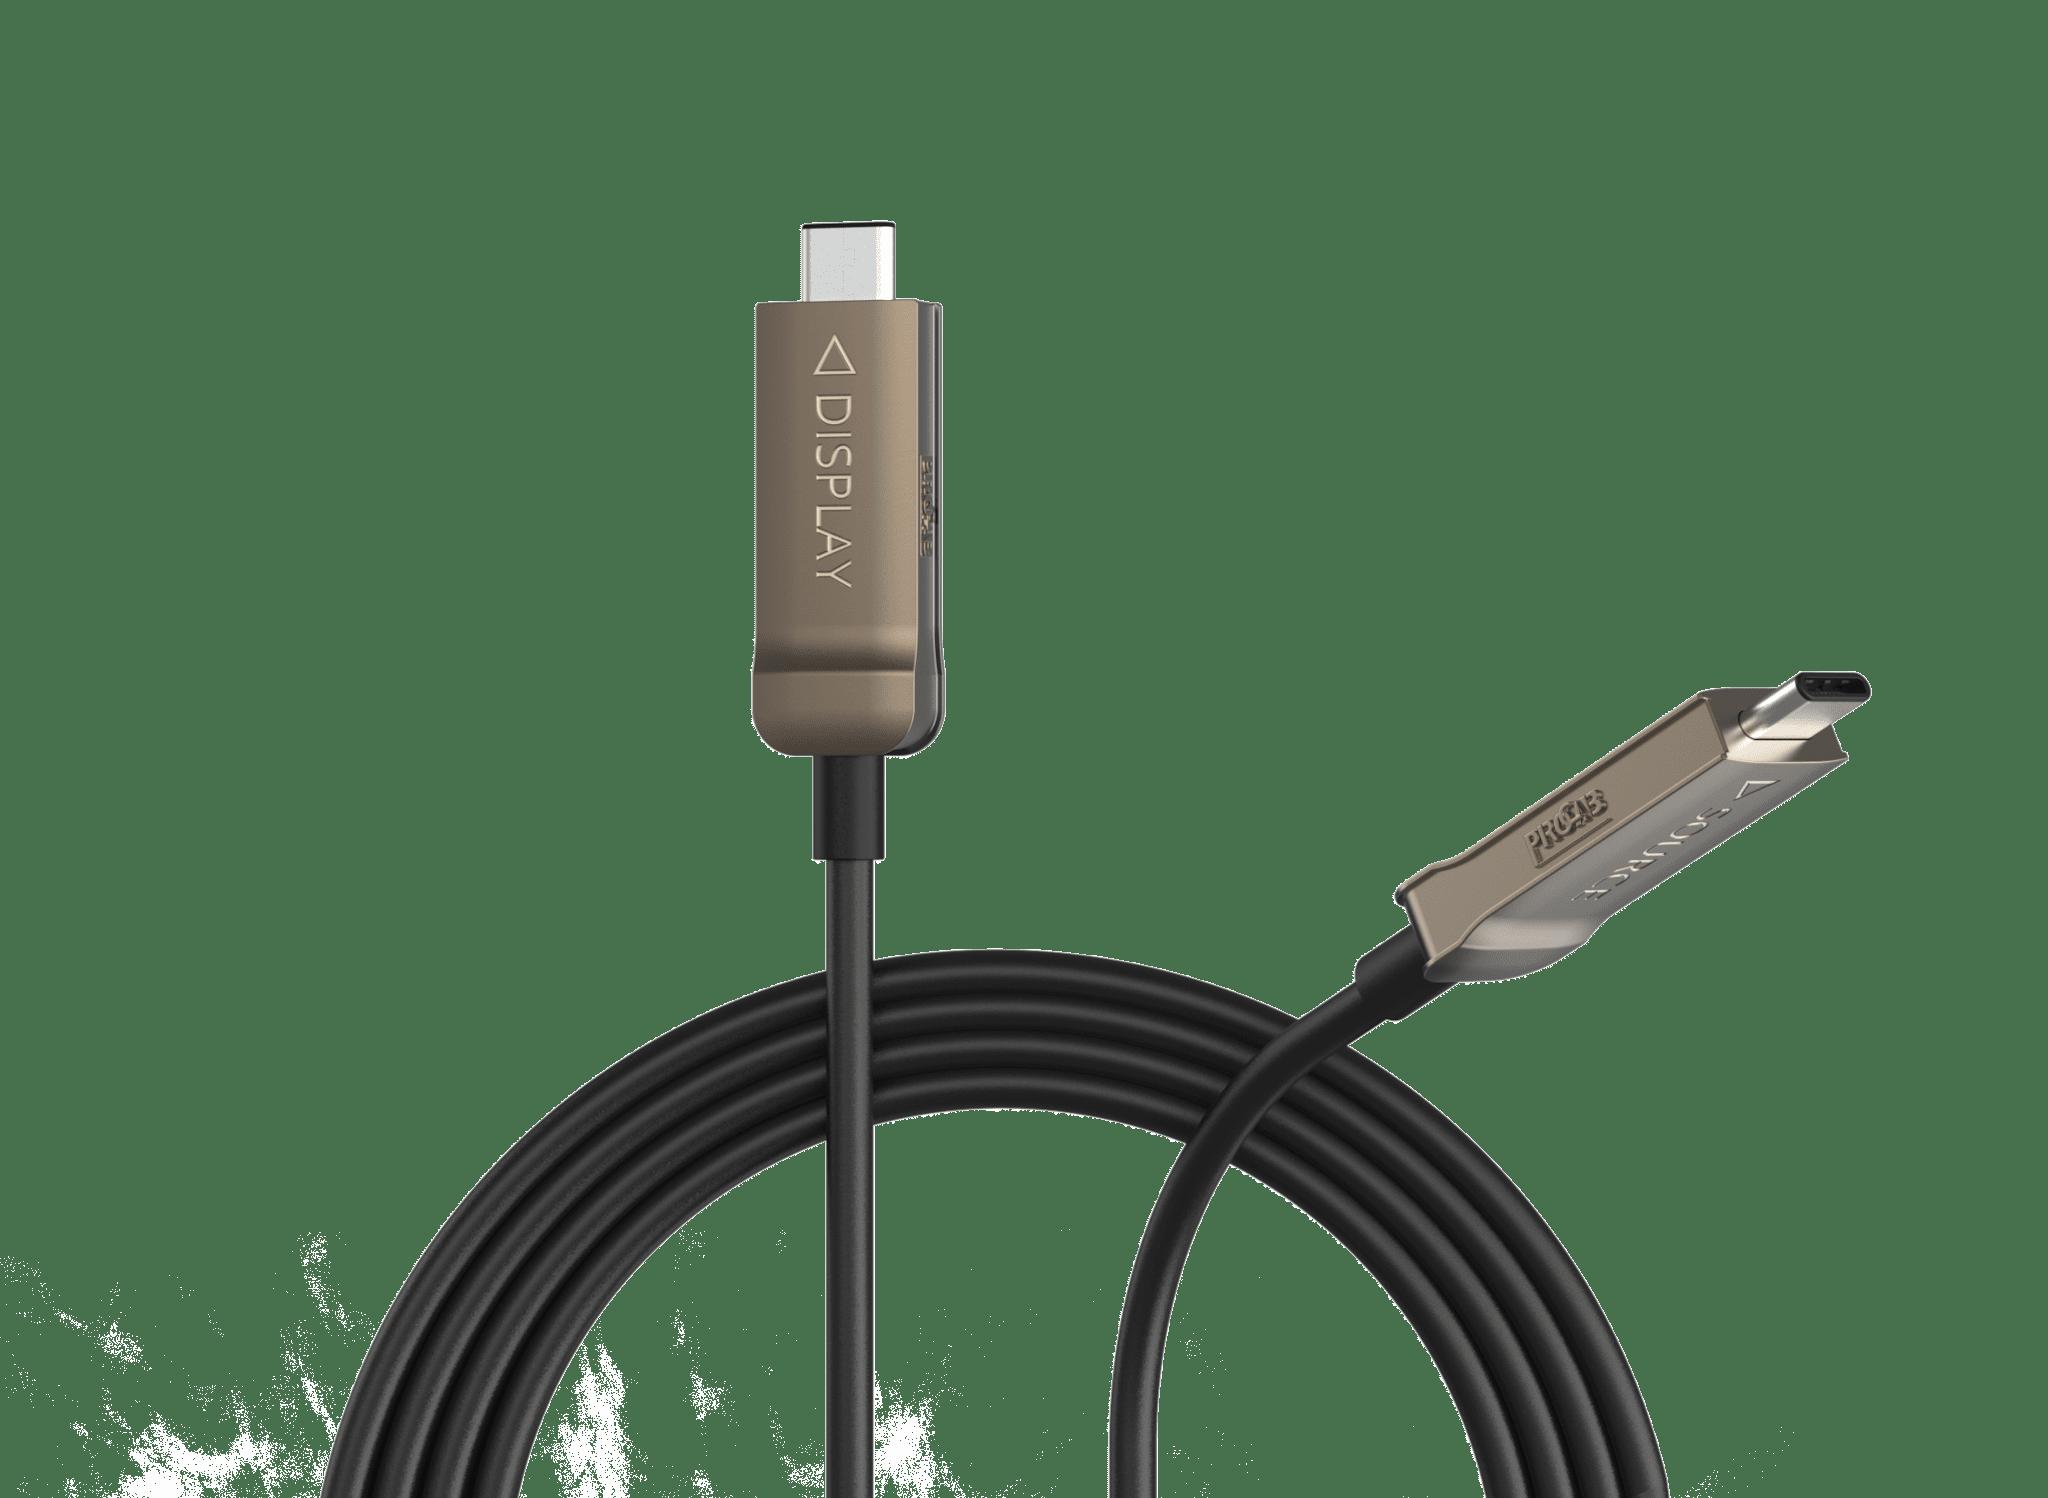 USB cables -